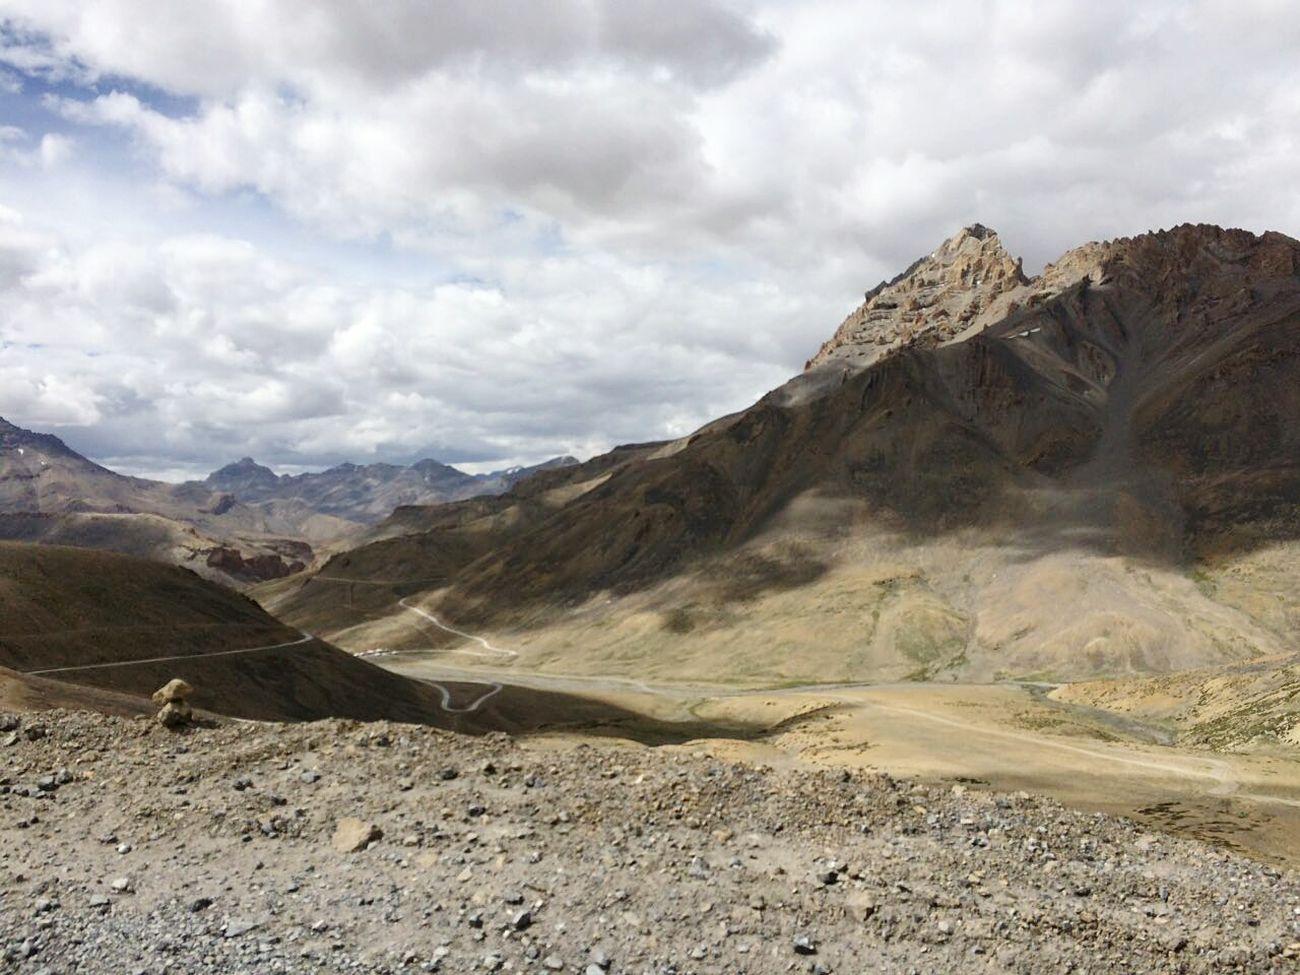 Mountain Tranquil Scene Landscape Scenics Tranquility Physical Geography Mountain Range Transportation Rock Formation Remote Travel Destinations Cloud - Sky Rocky Leh Ladakh.. Heaven♥ Tourism @ranjhan